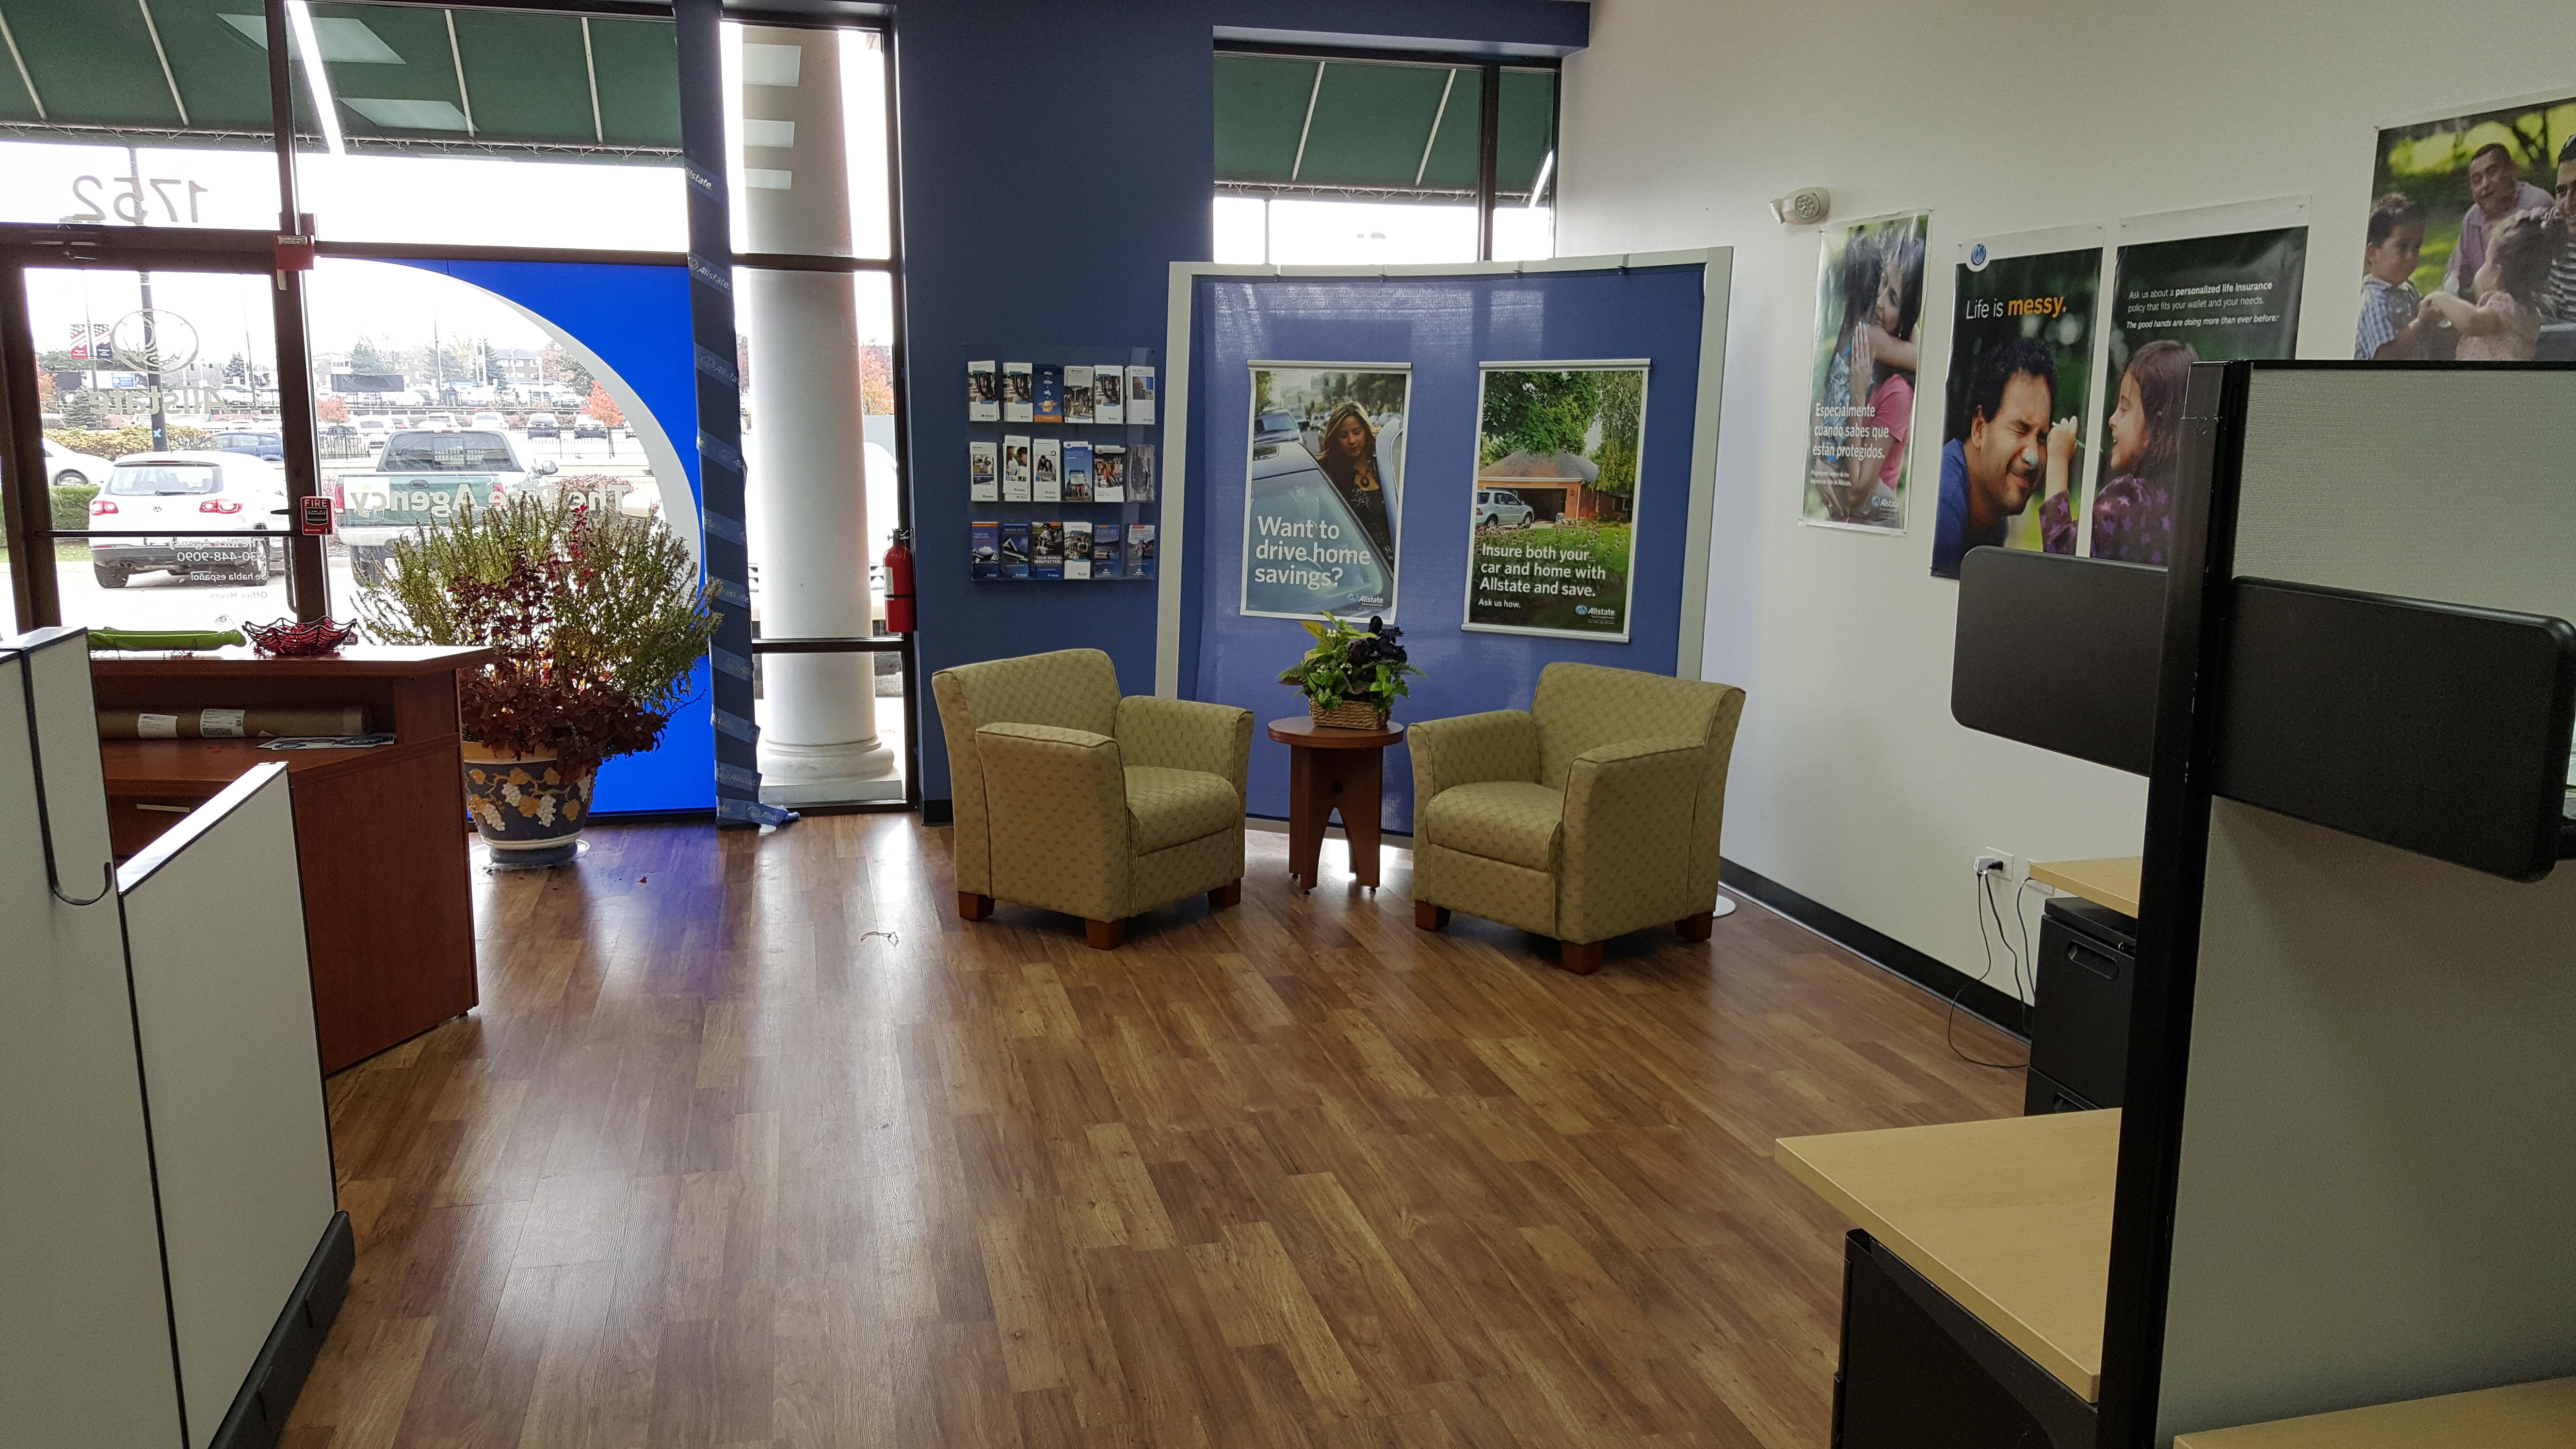 Duane Rice: Allstate Insurance image 2